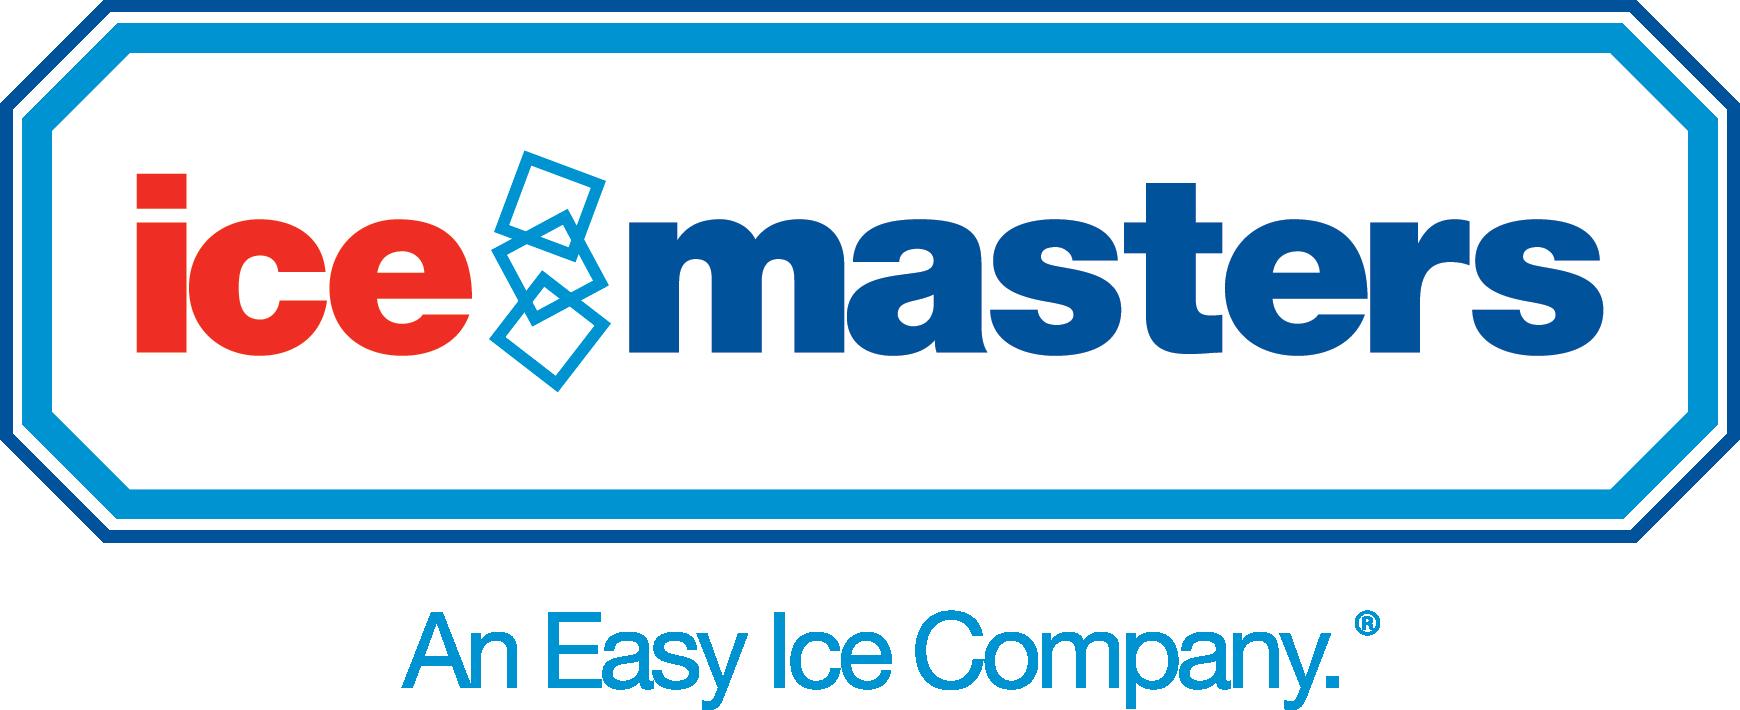 https://growthzonesitesprod.azureedge.net/wp-content/uploads/sites/1885/2021/03/Ice-Masters_color_large.png